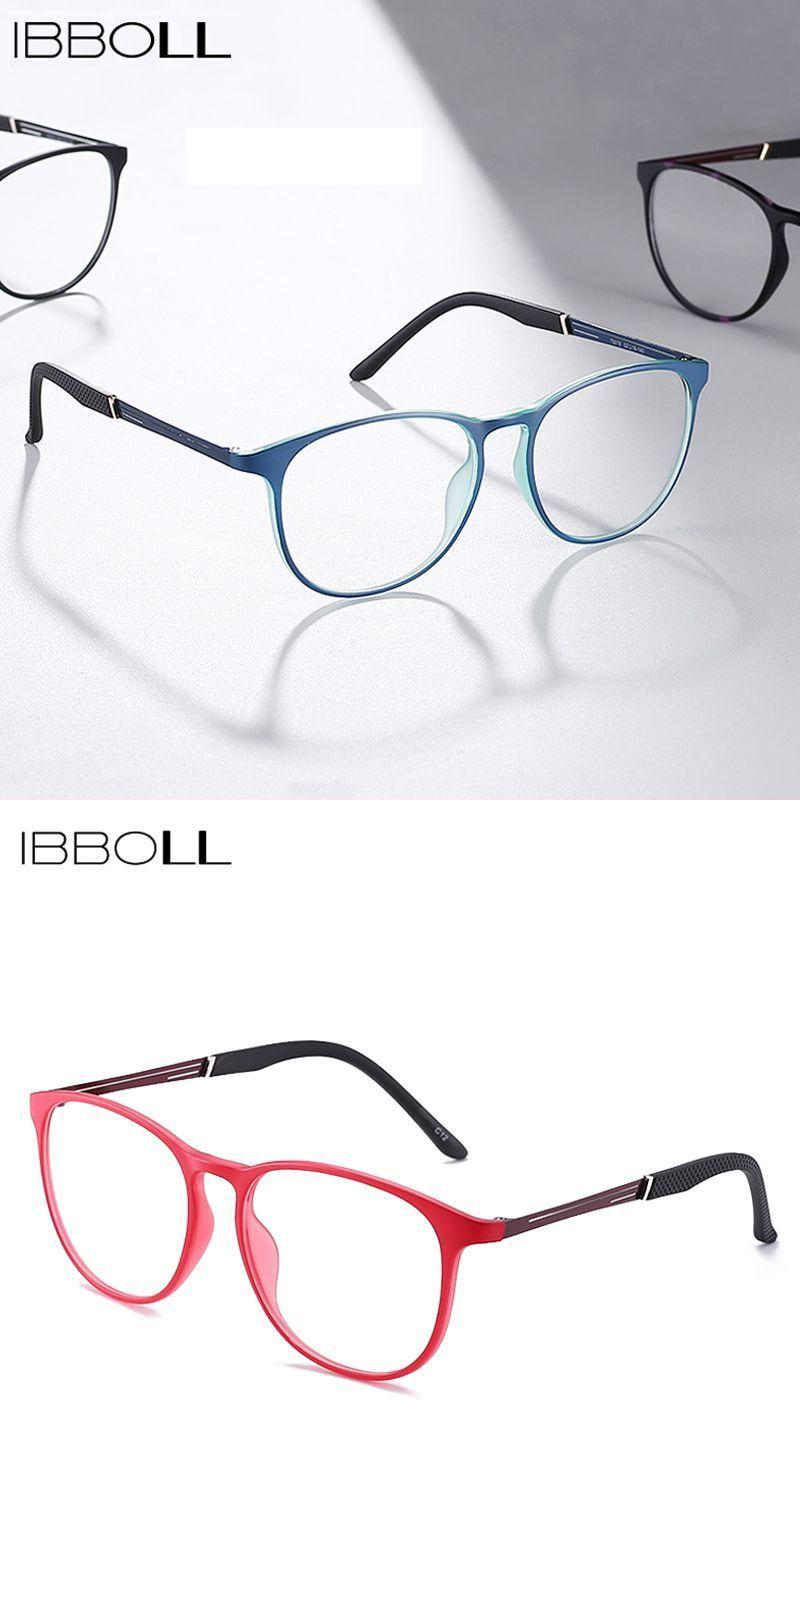 a3fee96f90 Luxury brand optical glasses frame women square plastic eyewear female male  classic eyglasses frames men oculos t5018  frames  eyewear  accessories   solid ...